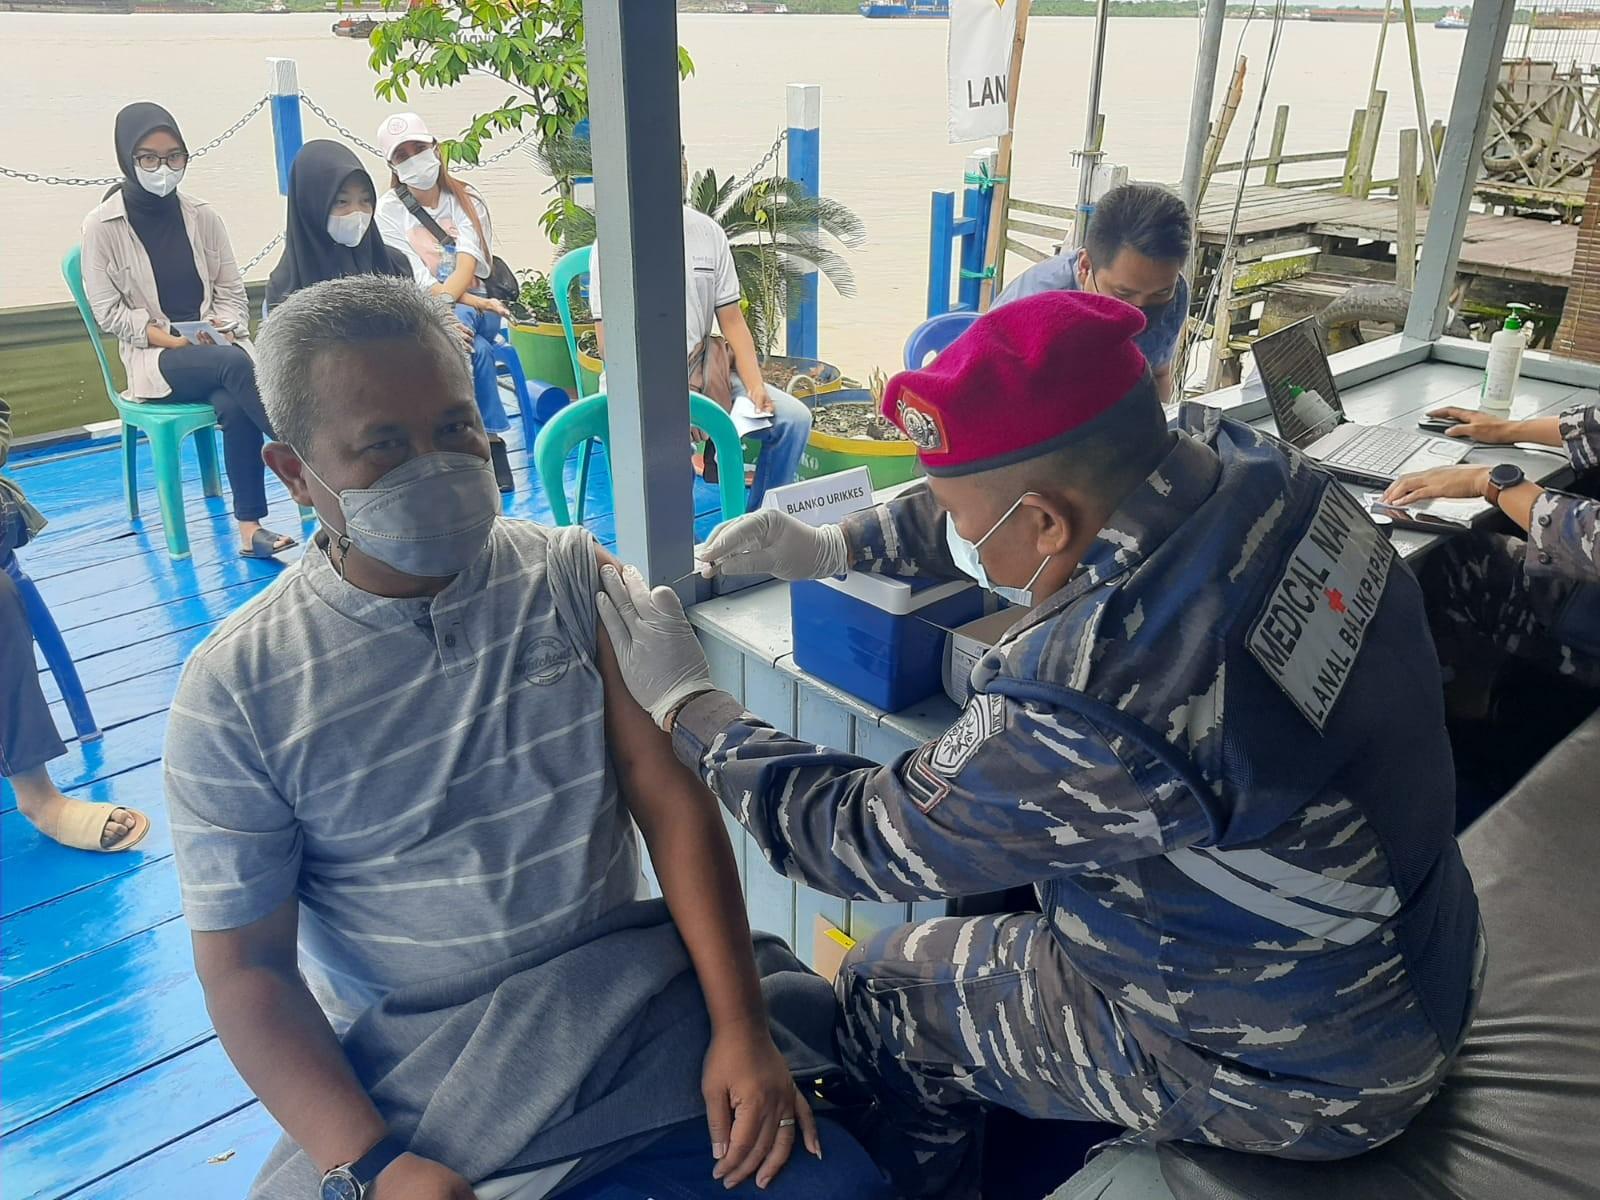 Sambut HUT TNI AL ke-76, Lanal Balikpapan Gelar Serbuan Vaksinasi di Anggana